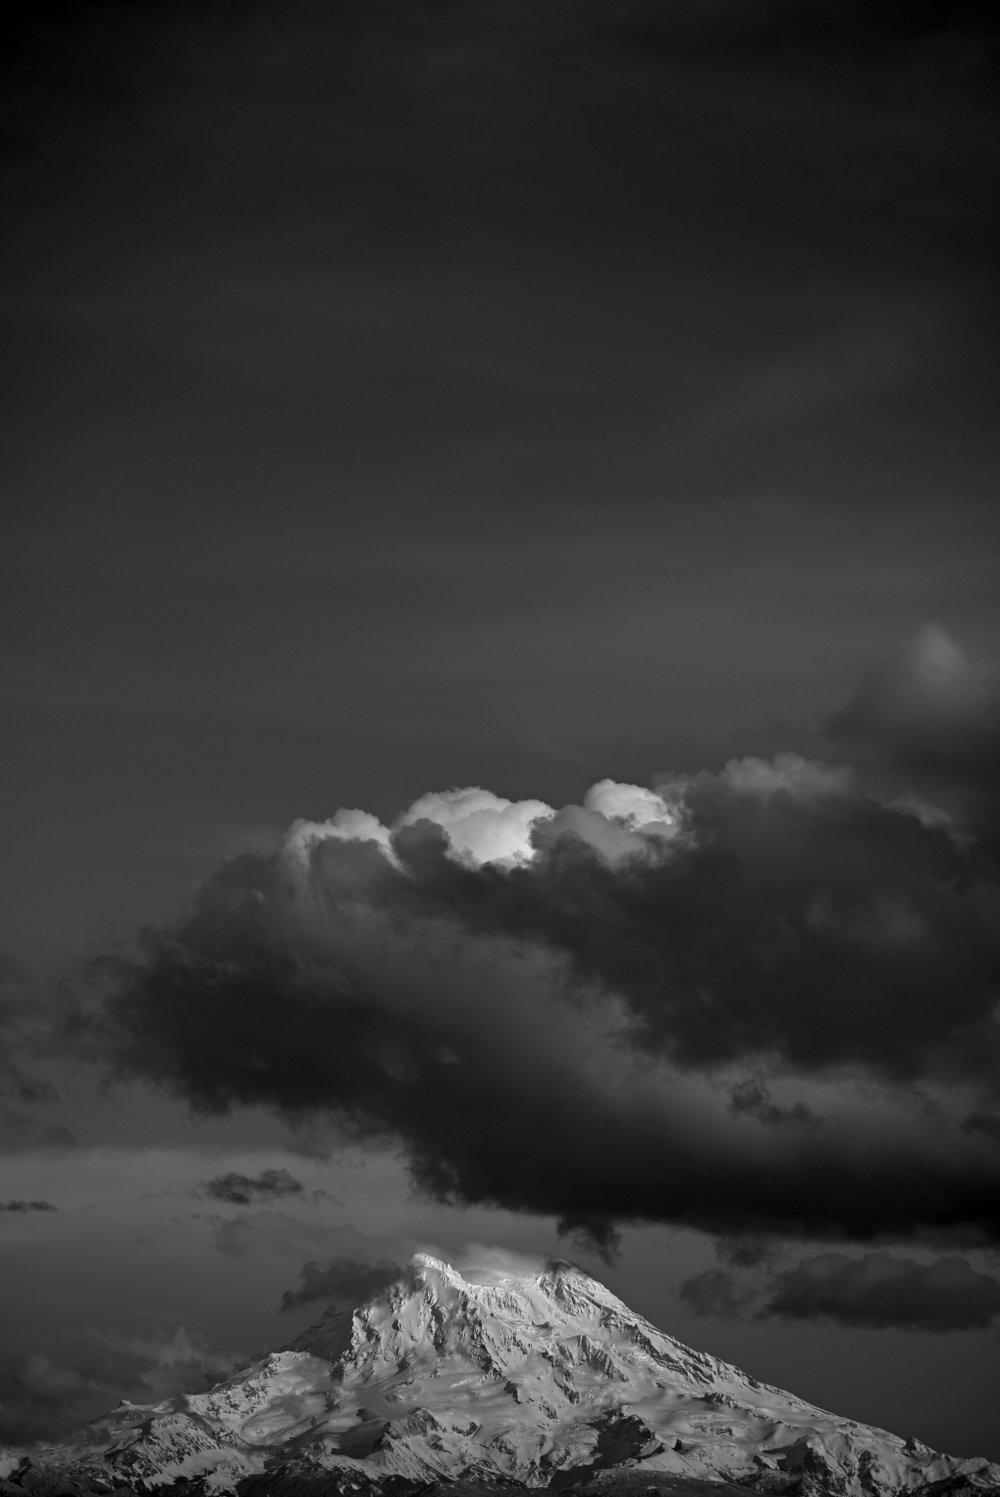 Instagram 1 -Storm over Mt Rainier -Rodrigo Etcheto.jpg